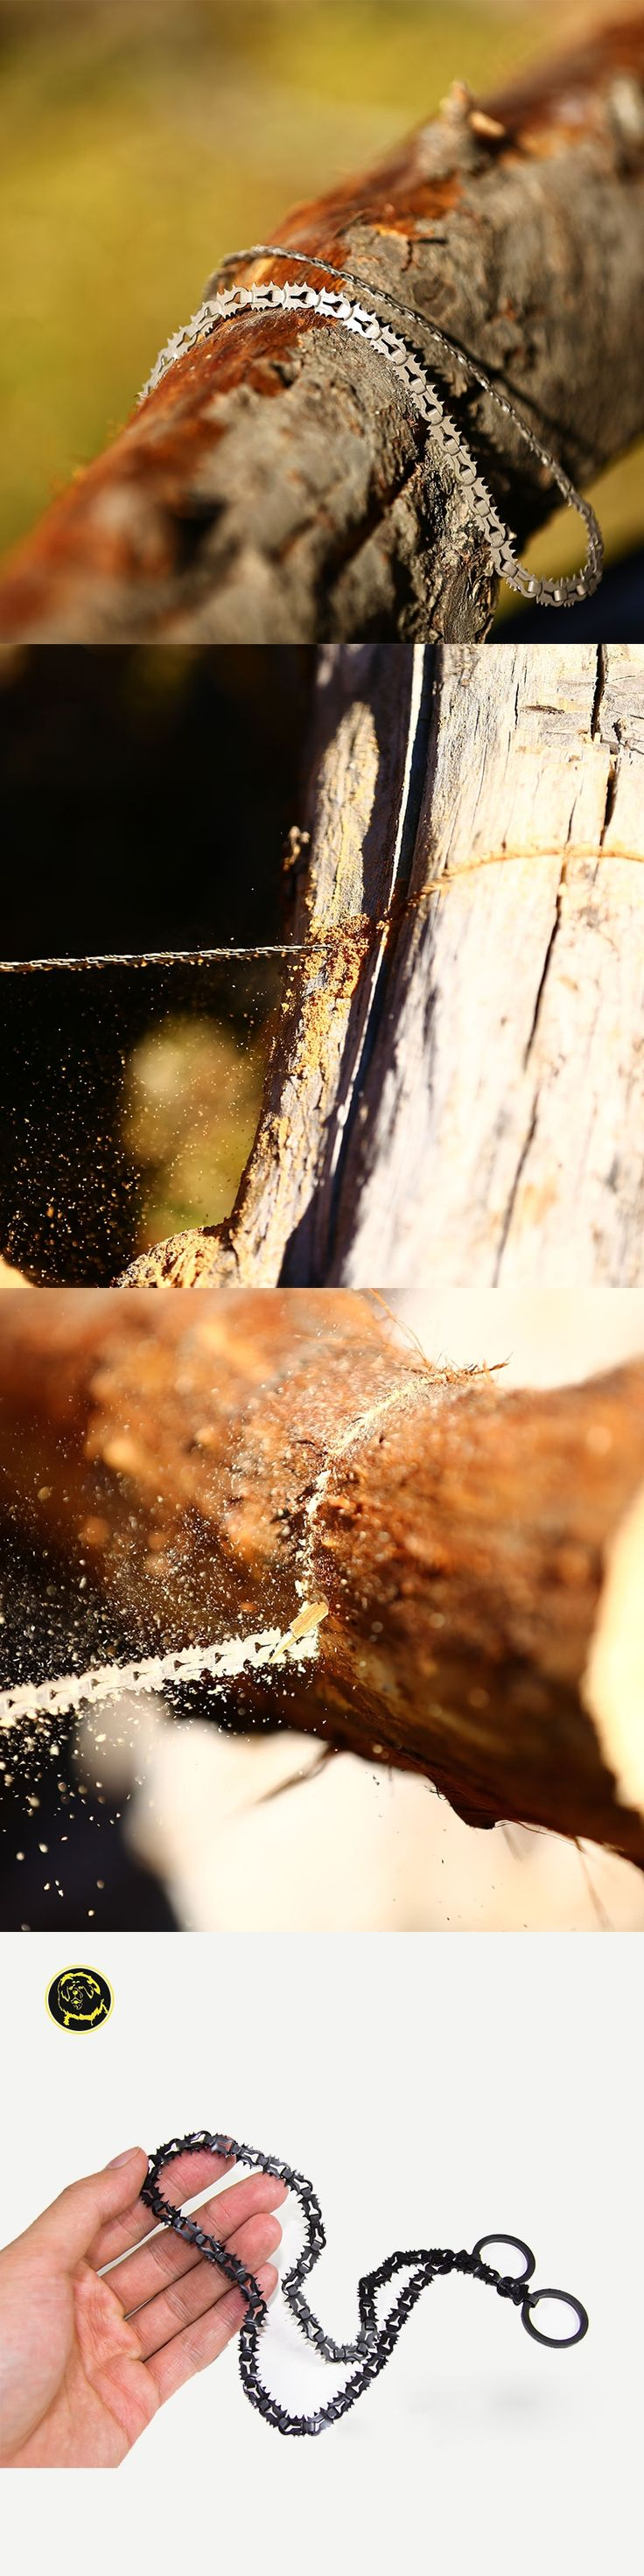 Survival Wire Saw Military Scroll Steel Saw Outdoor Hunting Tibetan mastiff chain saw serra testere hacksaw miter saw